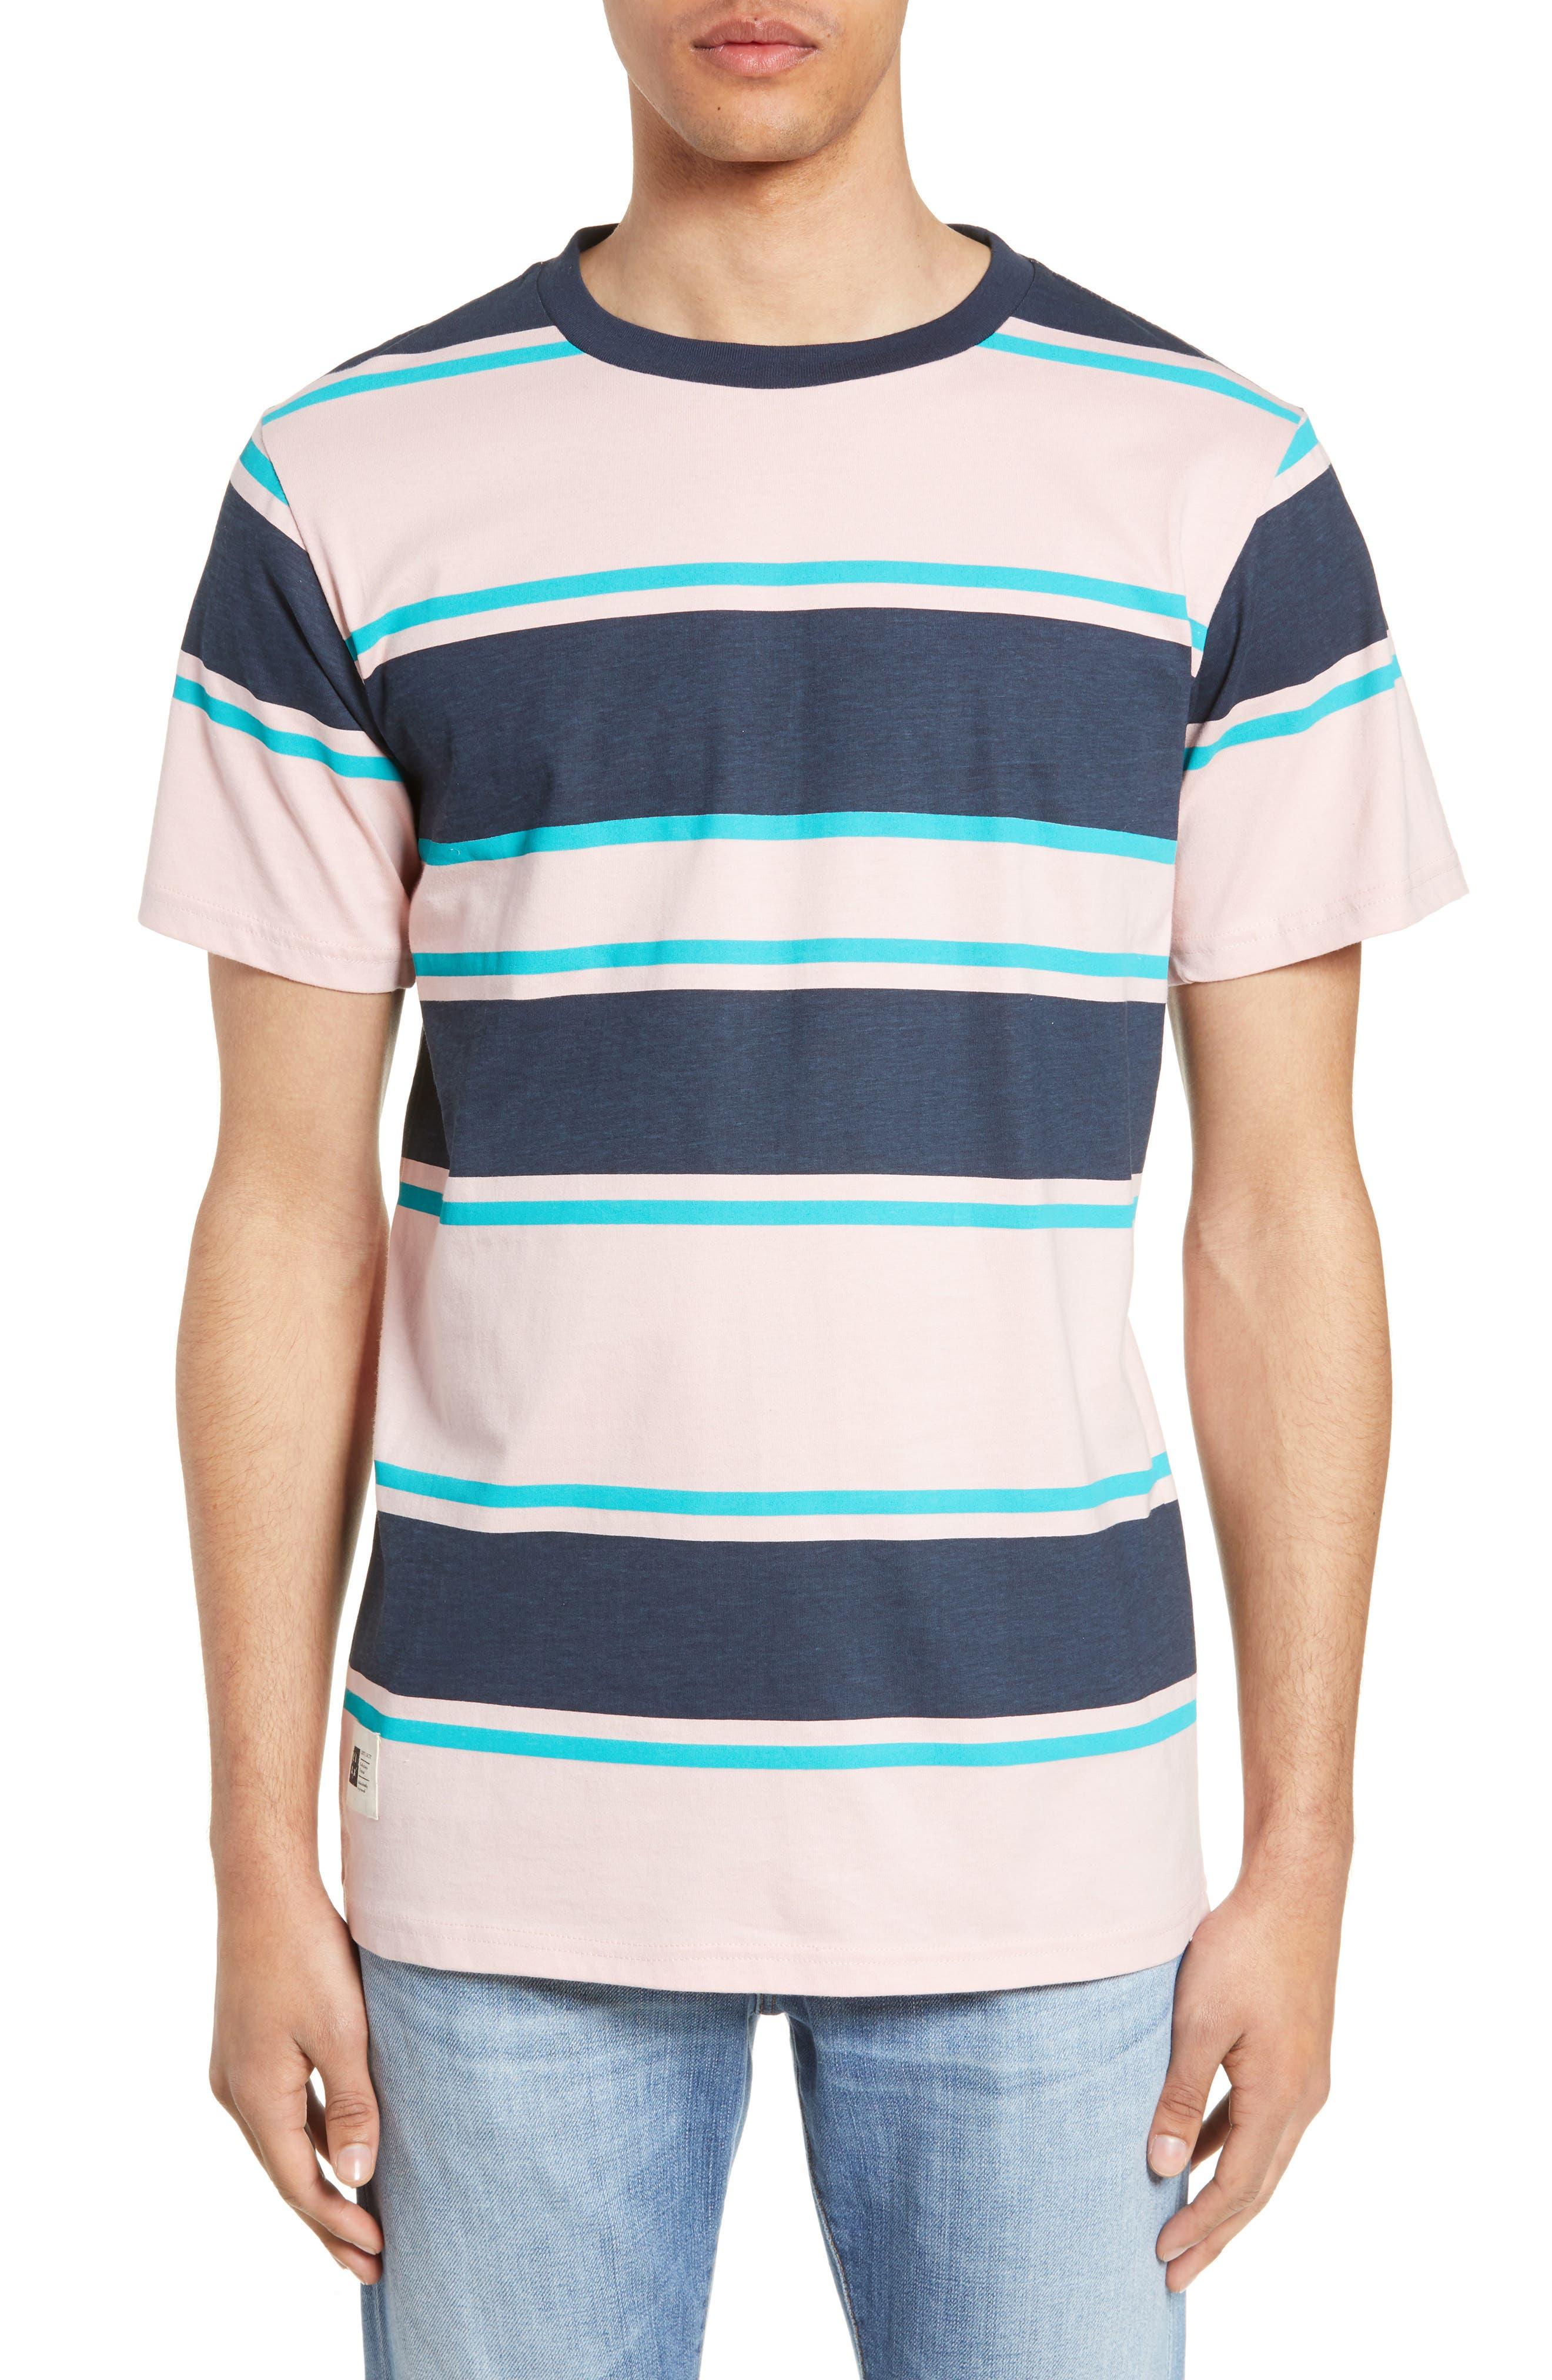 Lira Clothing Clickstripe T-Shirt, Pink